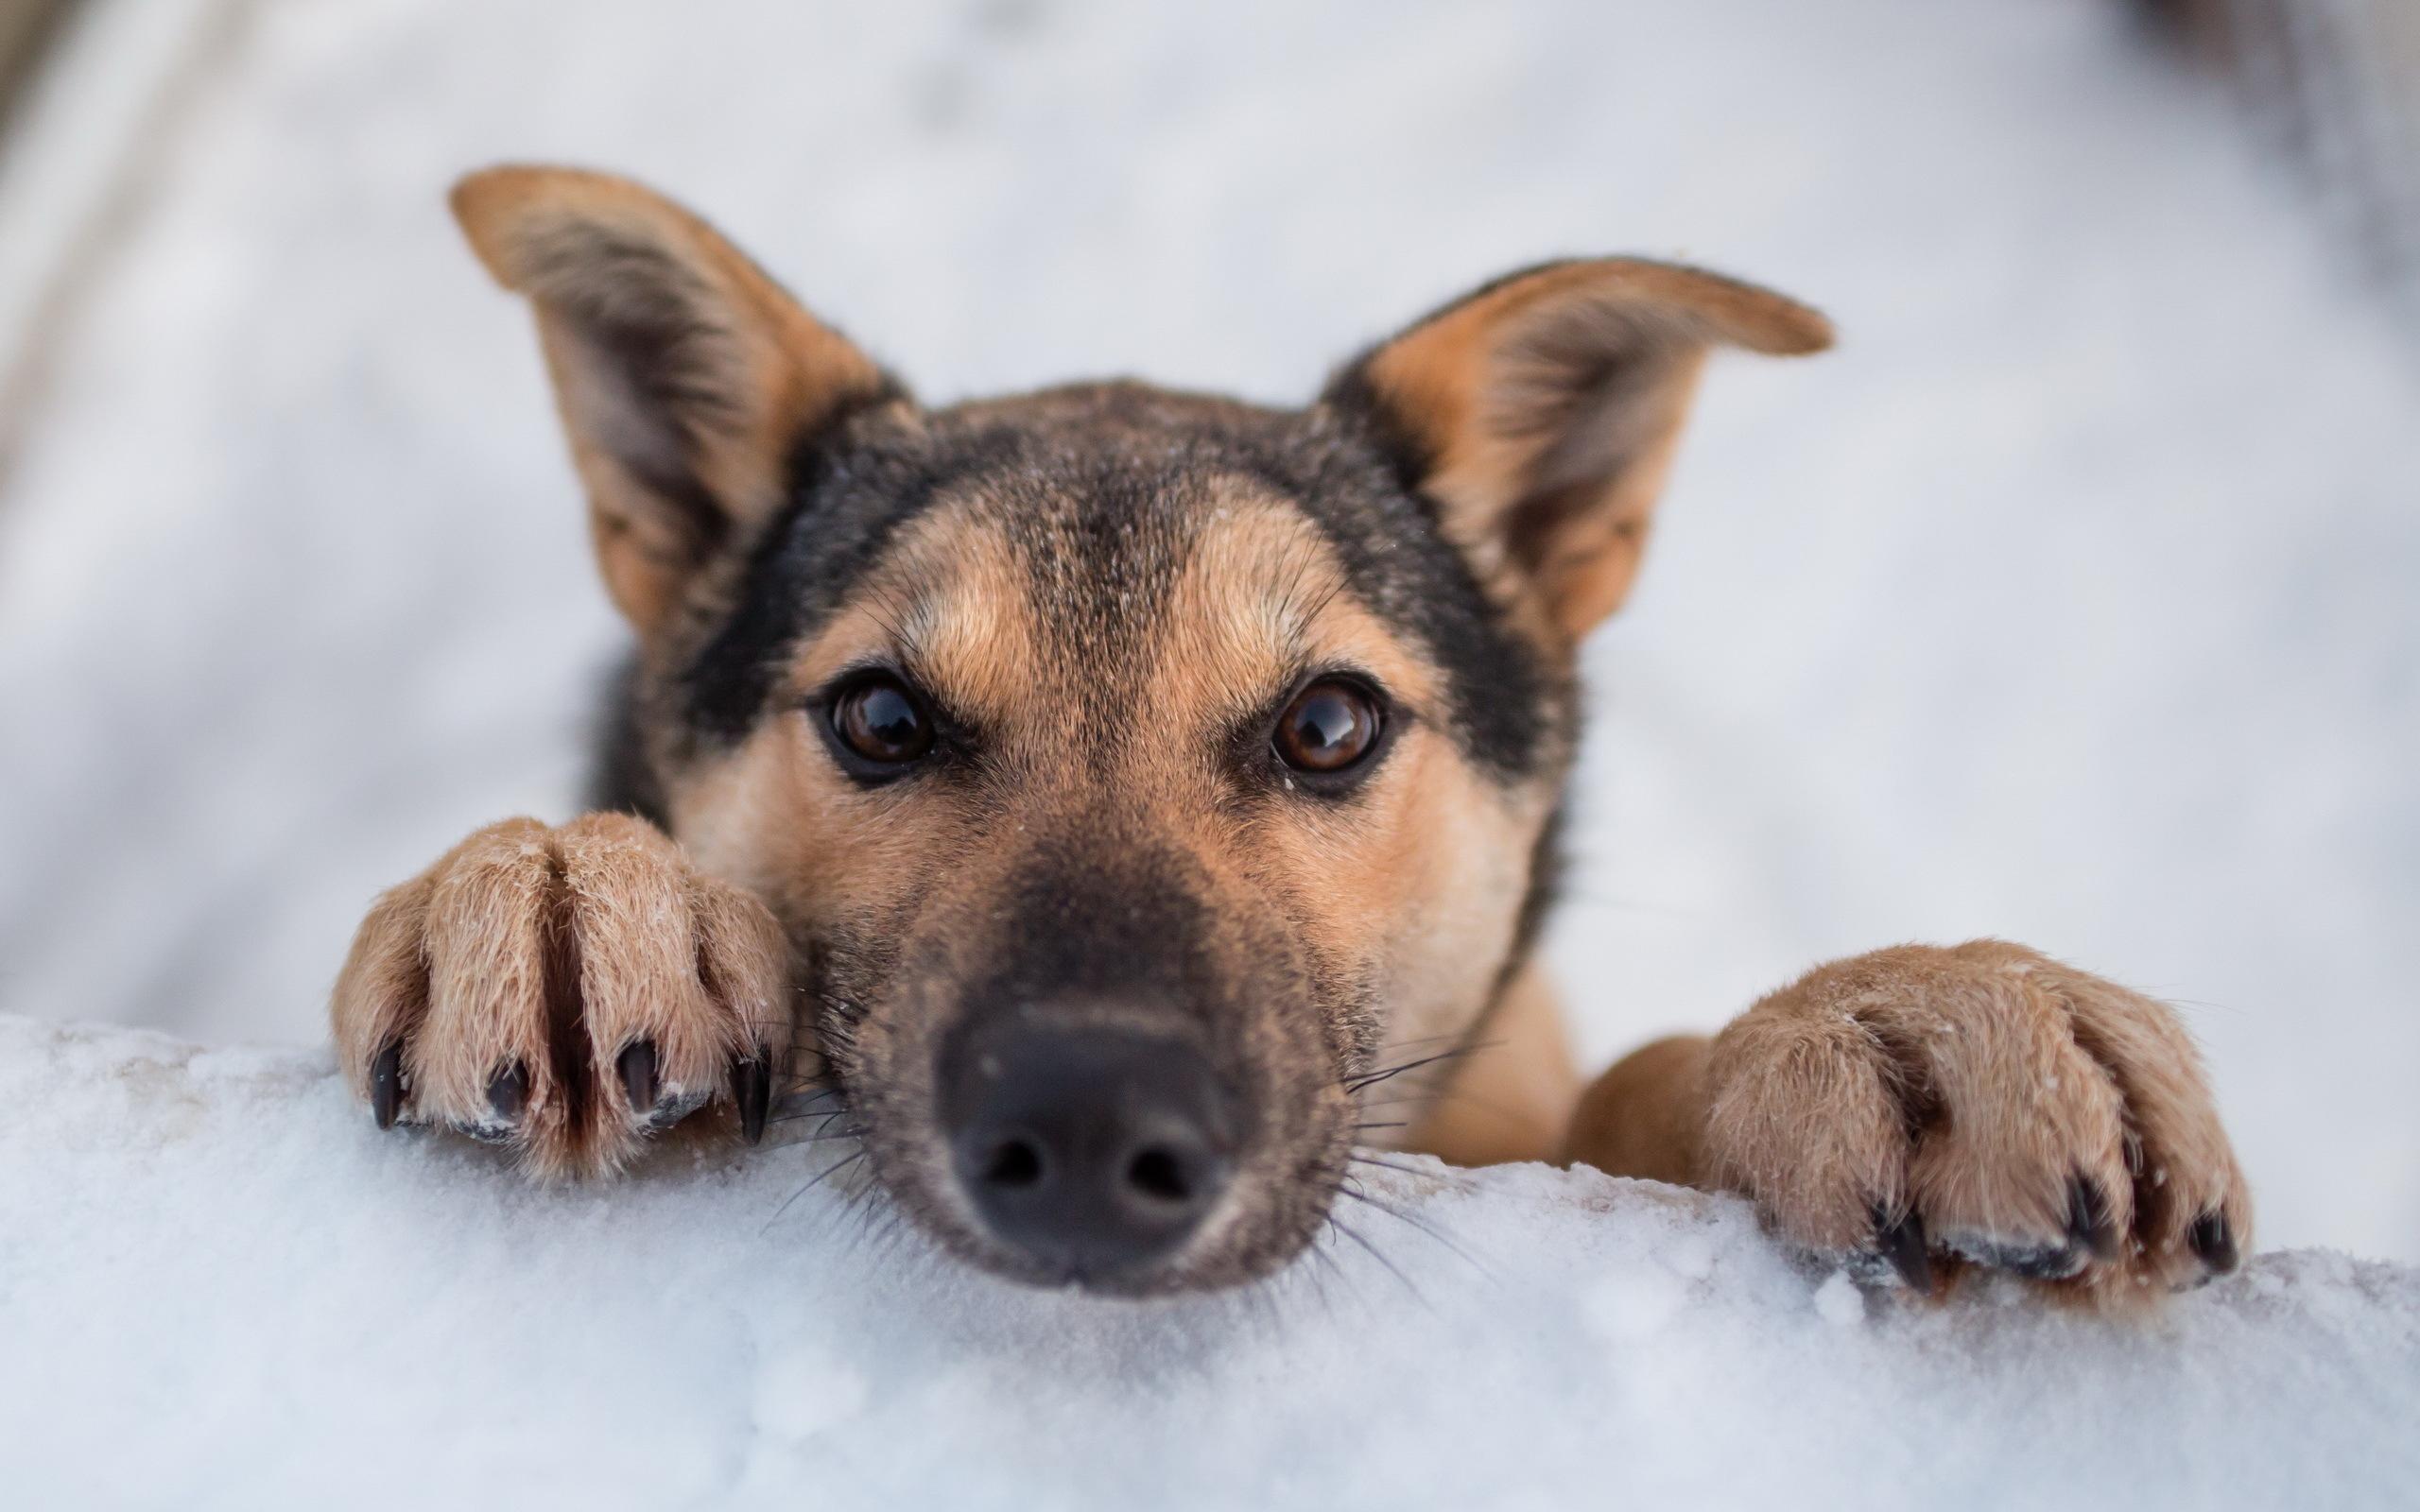 Puppies dogs puppy winter snow wallpaper 2560x1600 219389 2560x1600